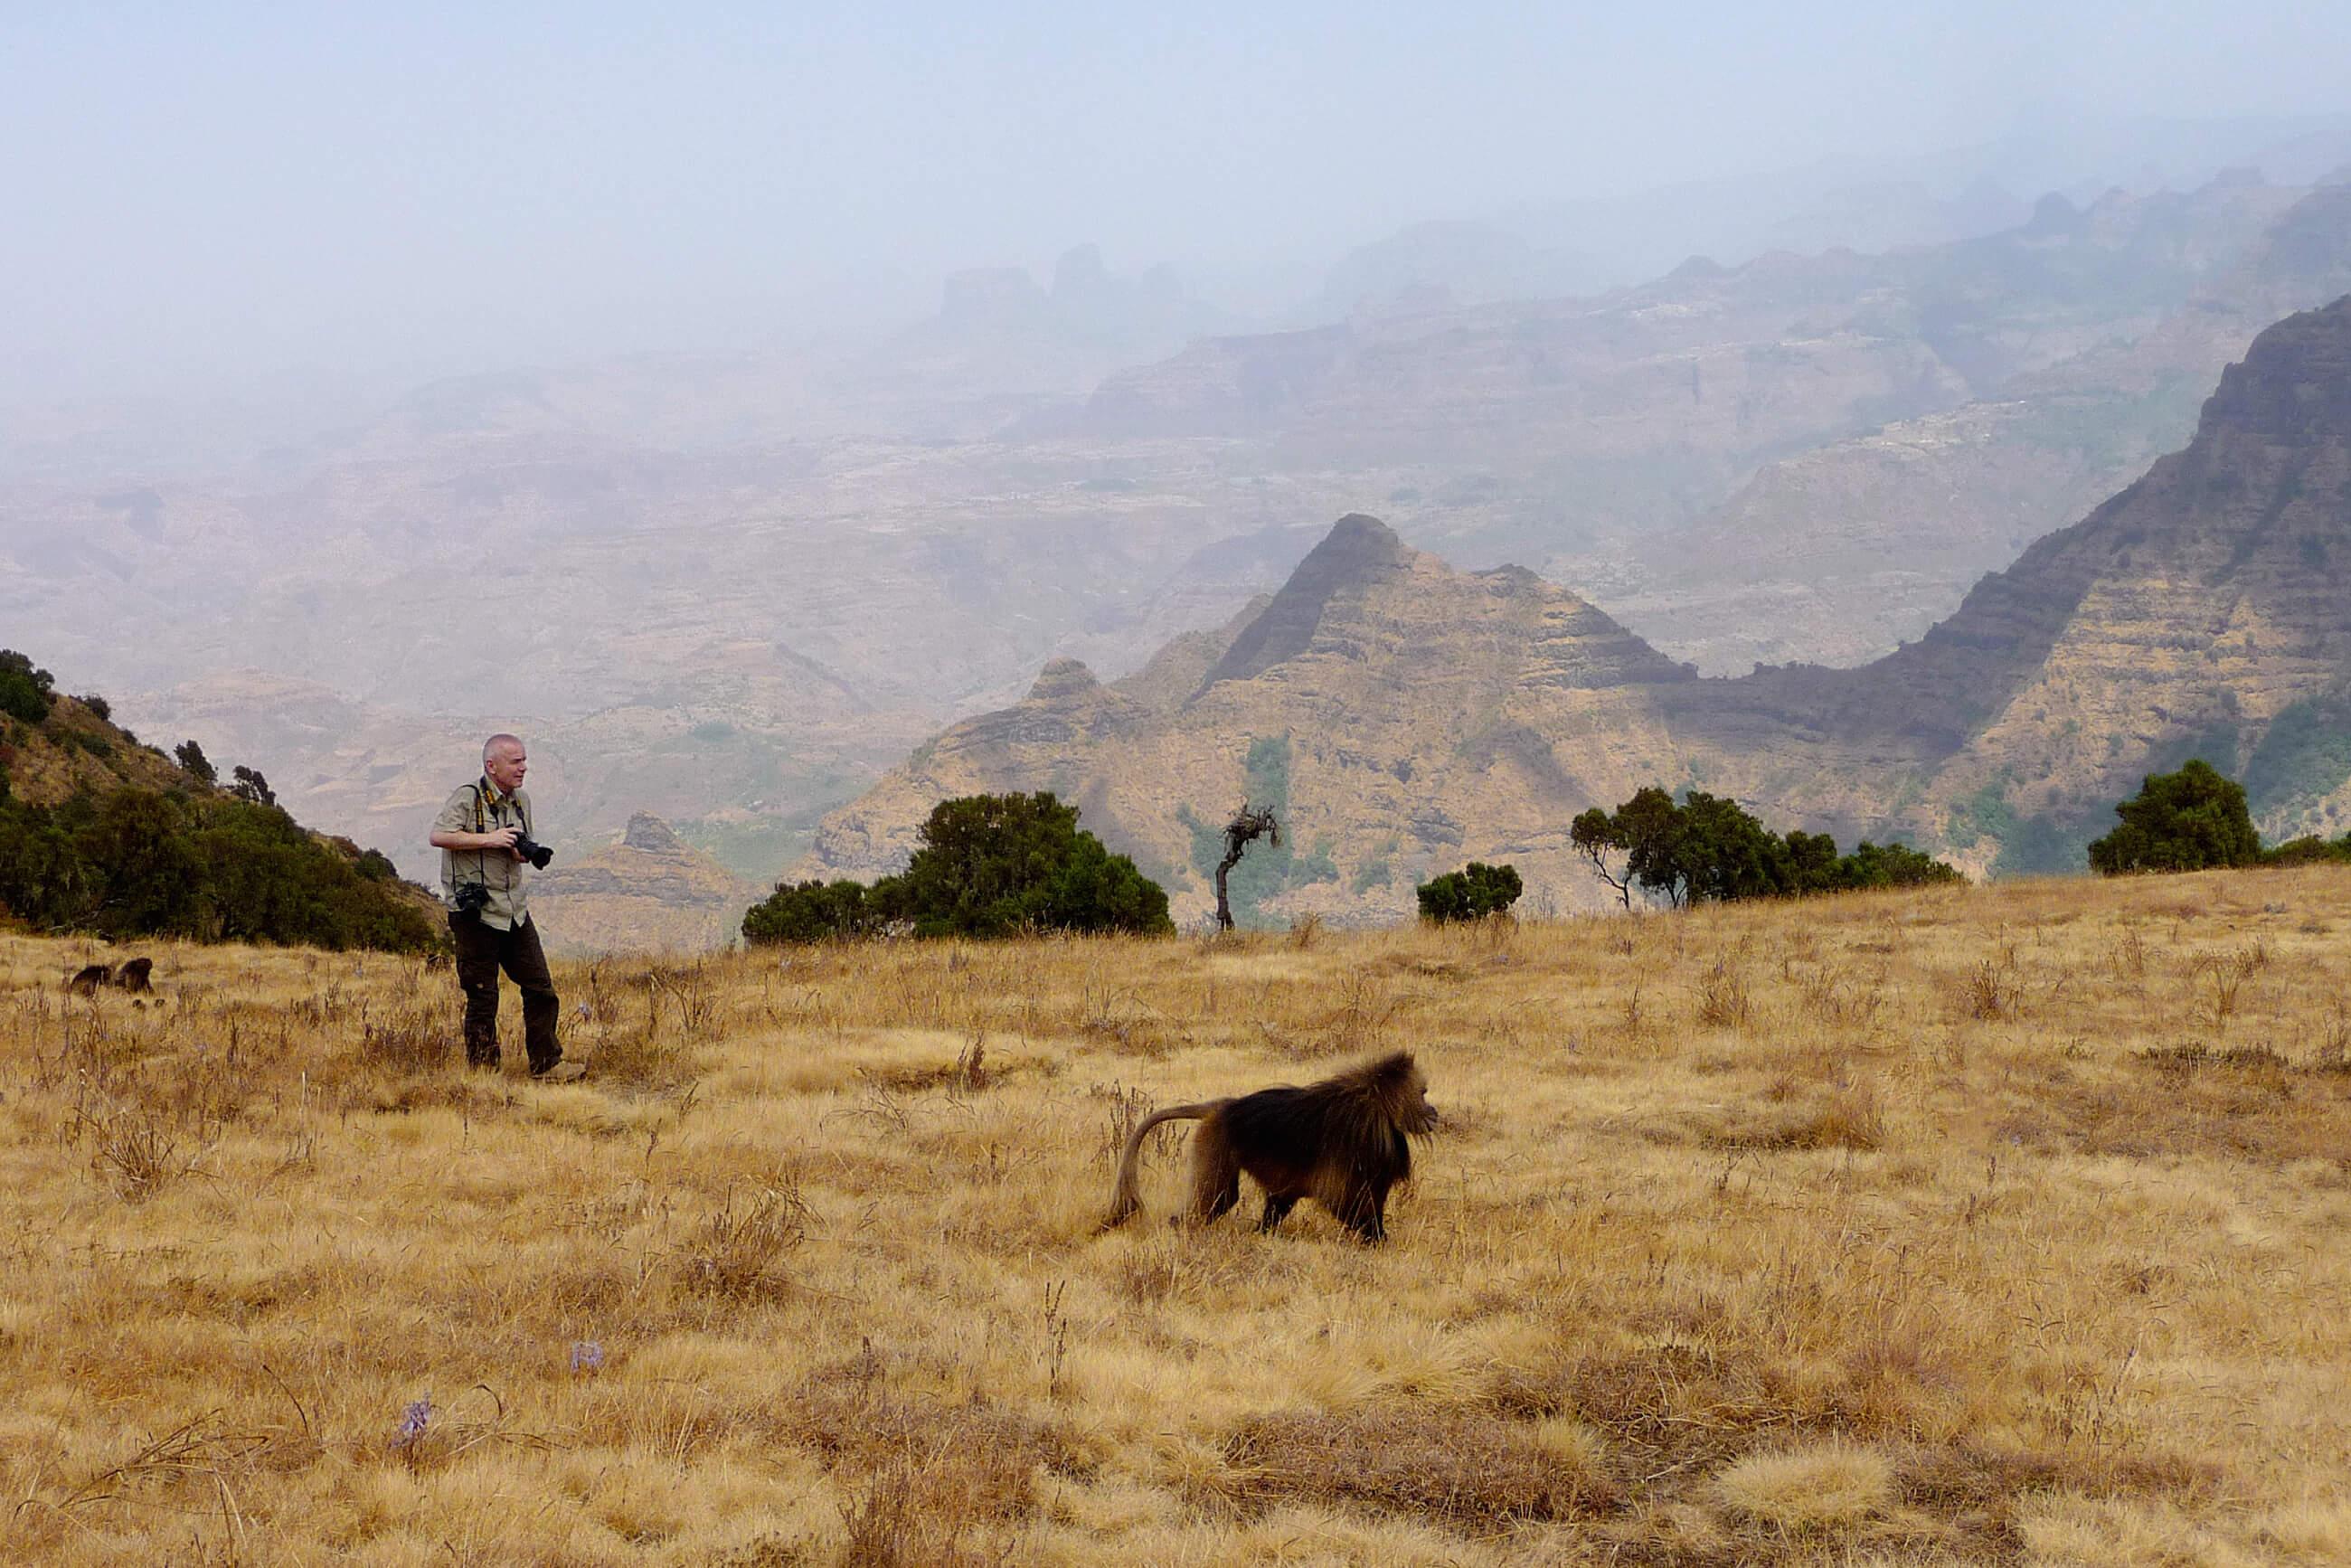 https://bubo.sk/uploads/galleries/7392/archiv_etiopia_p1290371.jpg